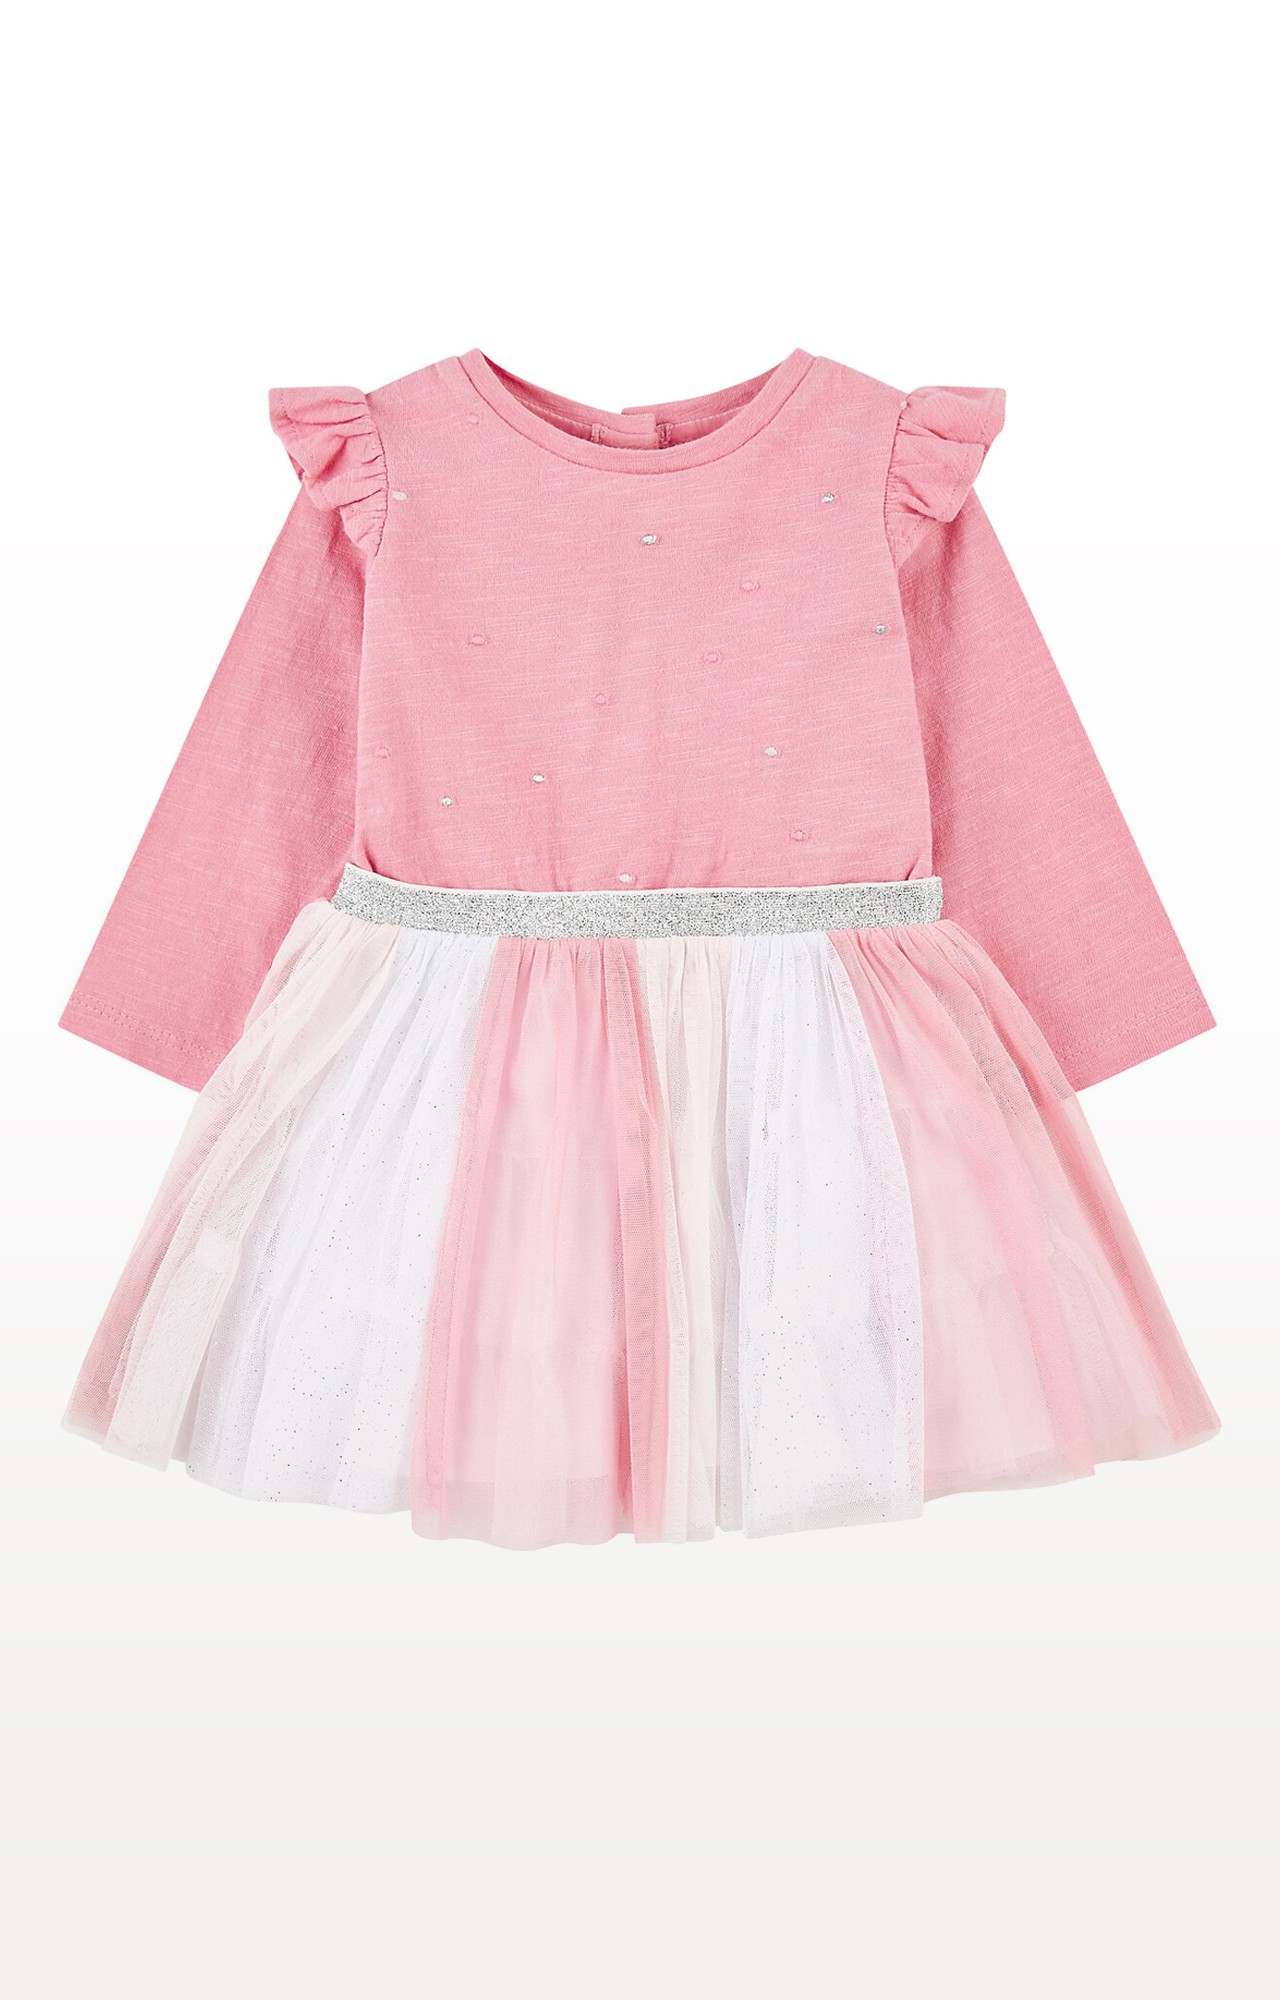 Mothercare | Pink Glitter Stripe Frill Twofer Dress